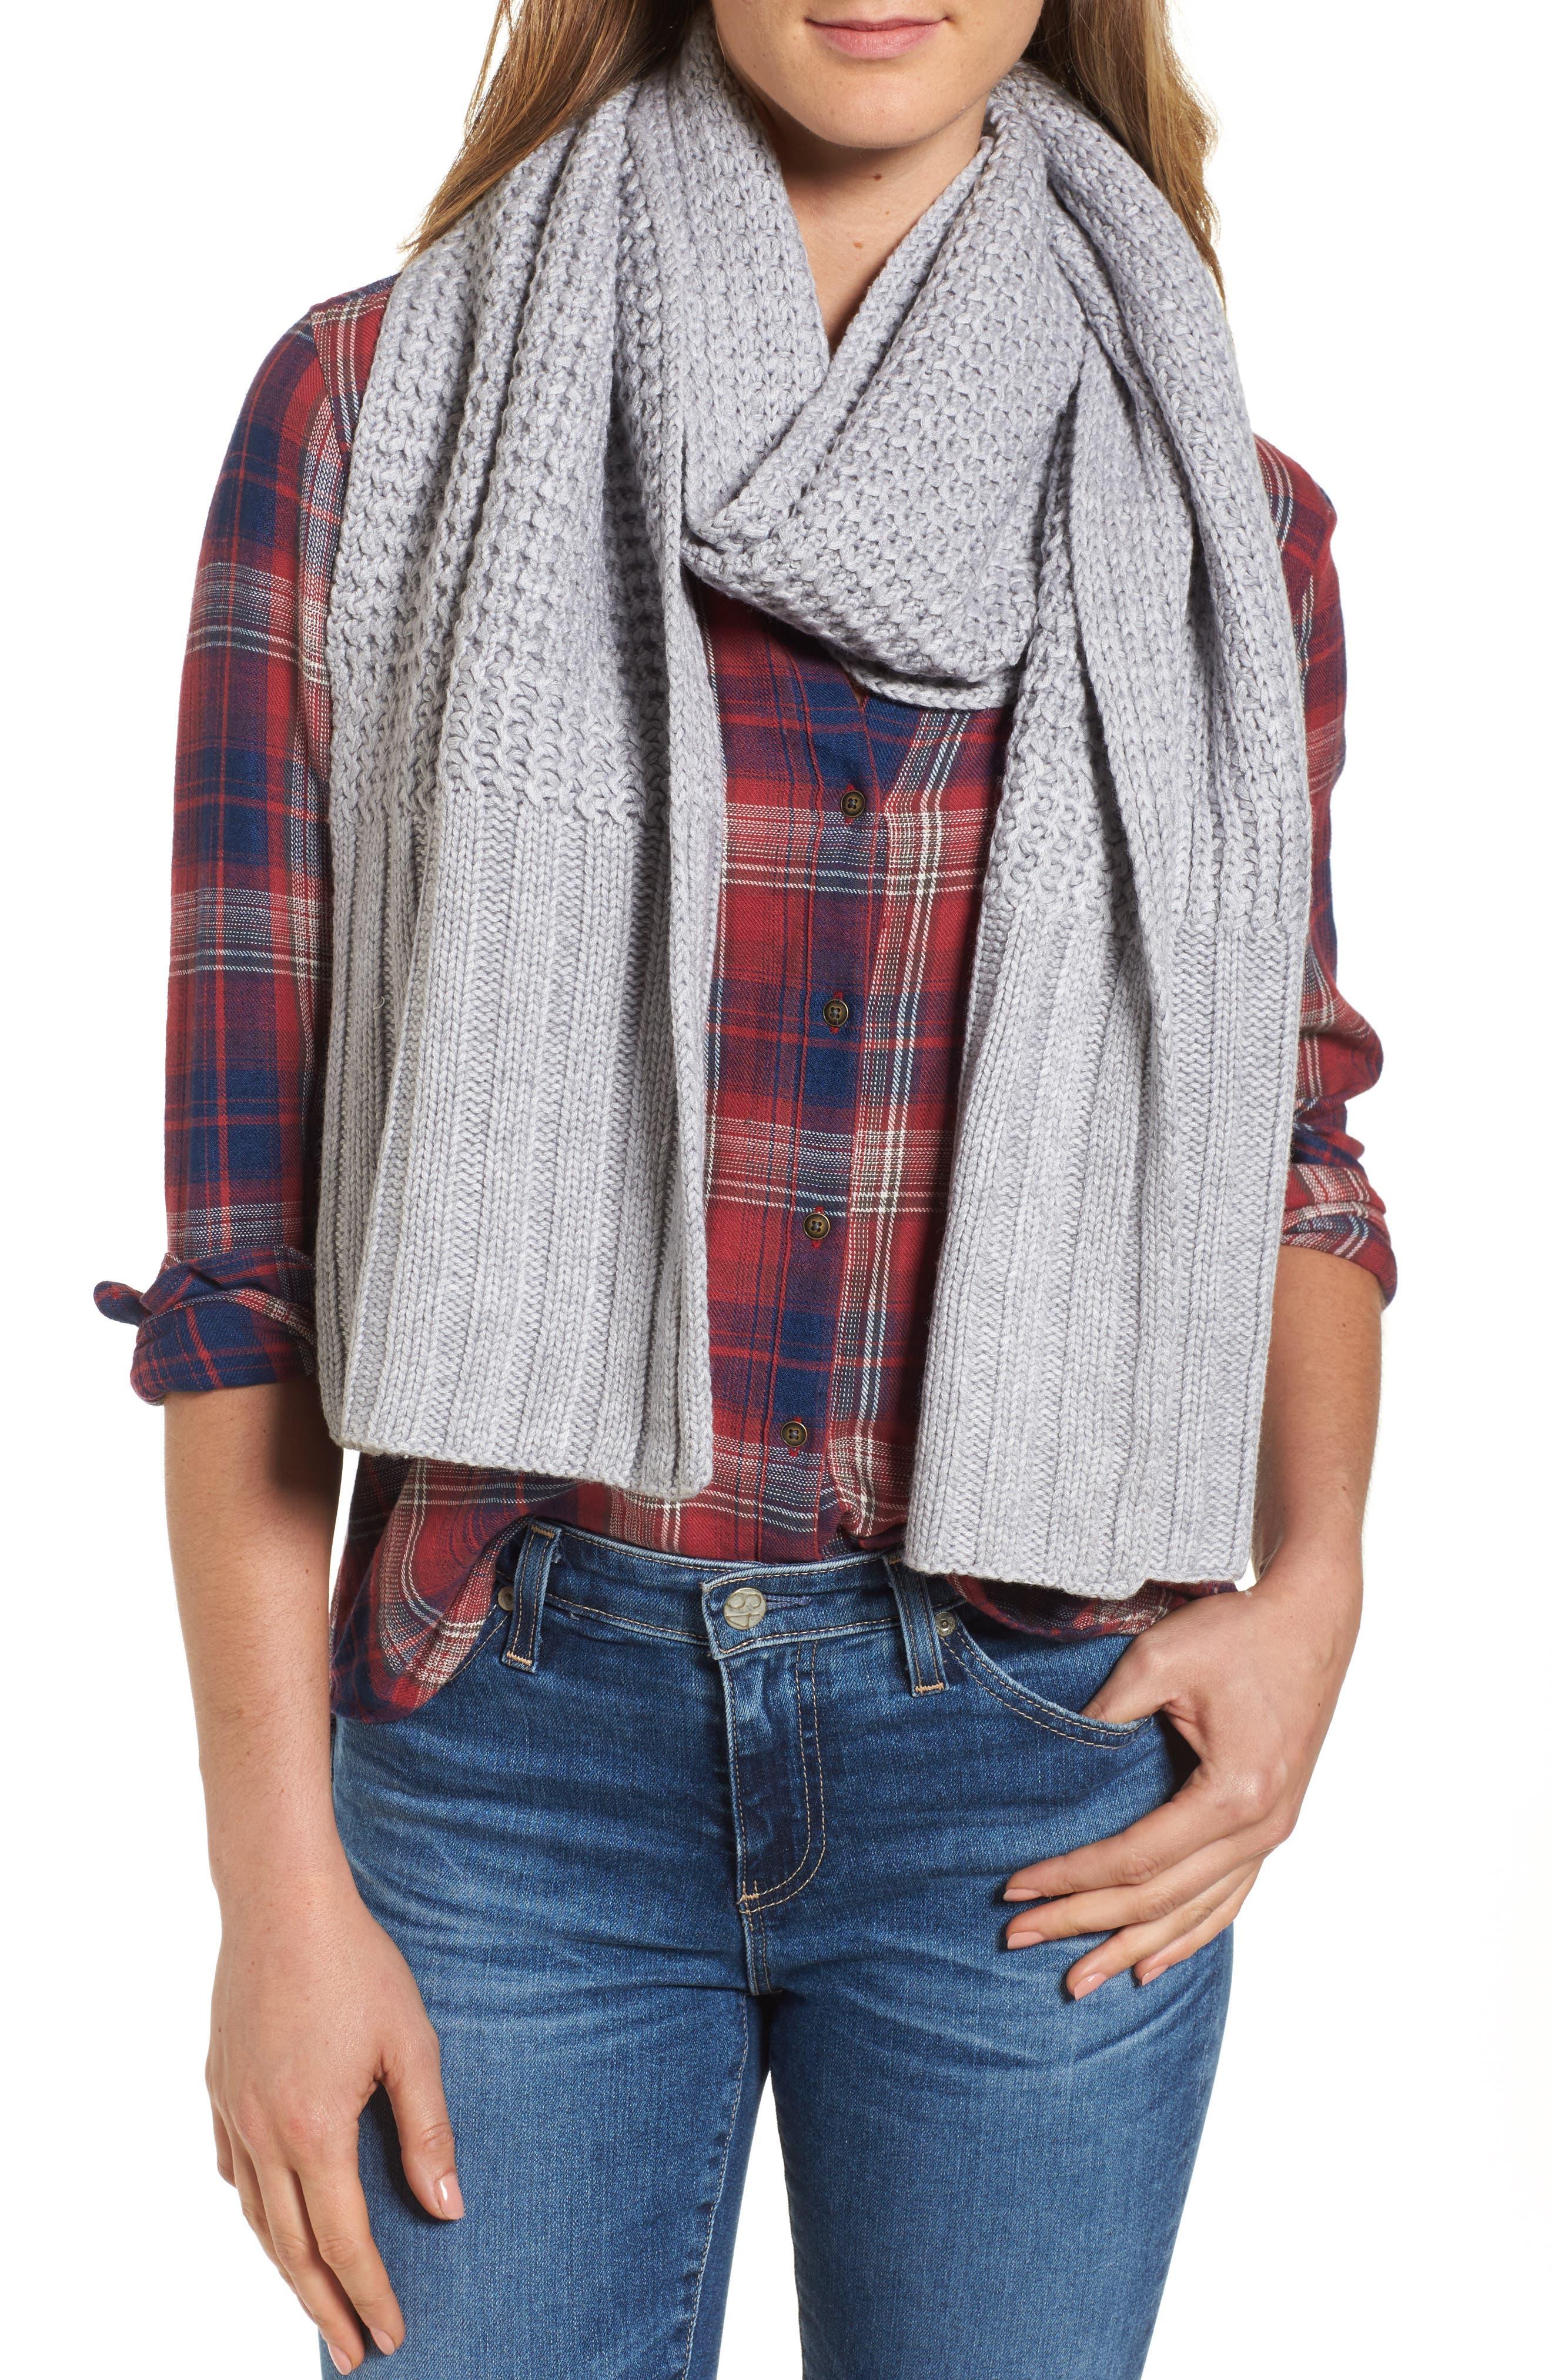 Alternate Image 1 Selected - UGG® Textured Wool Blend Cardi Scarf